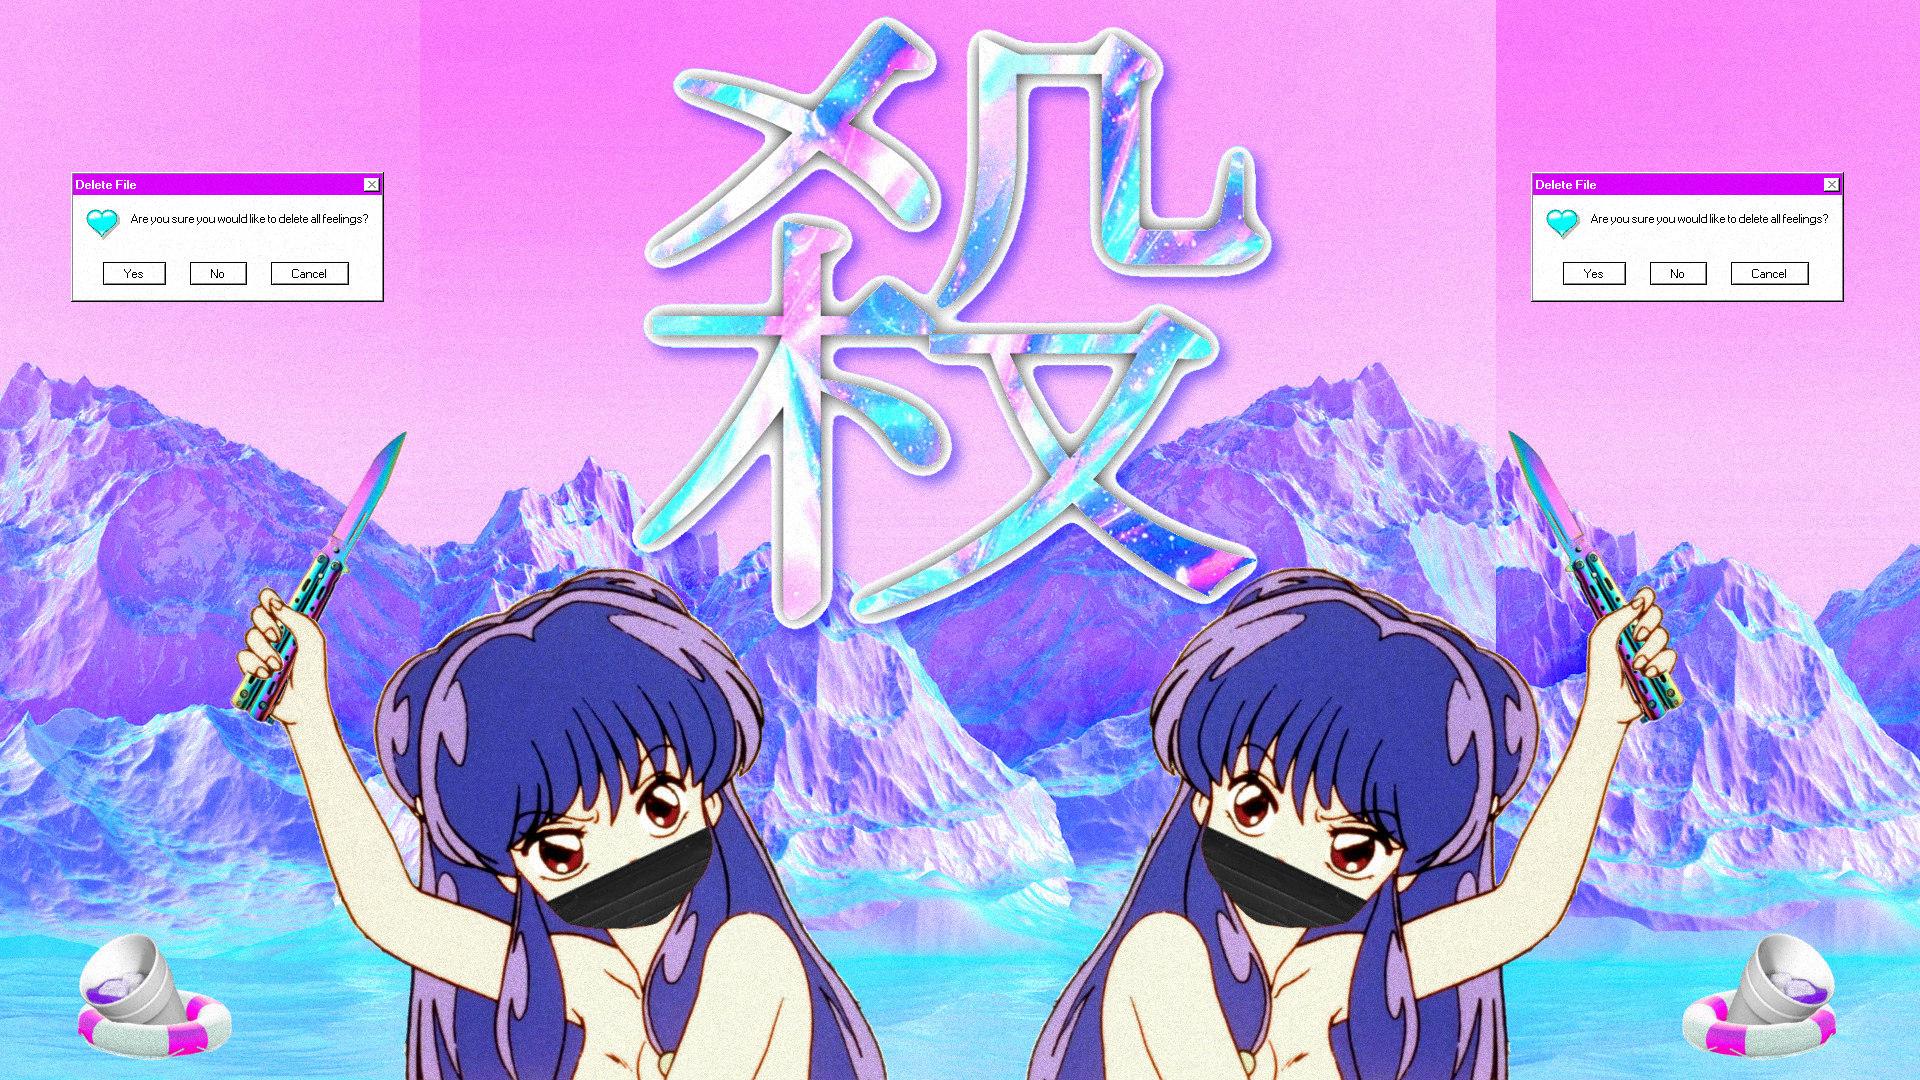 a e s t h e t i c Vaoorwave Wallpaper mostly anime dump